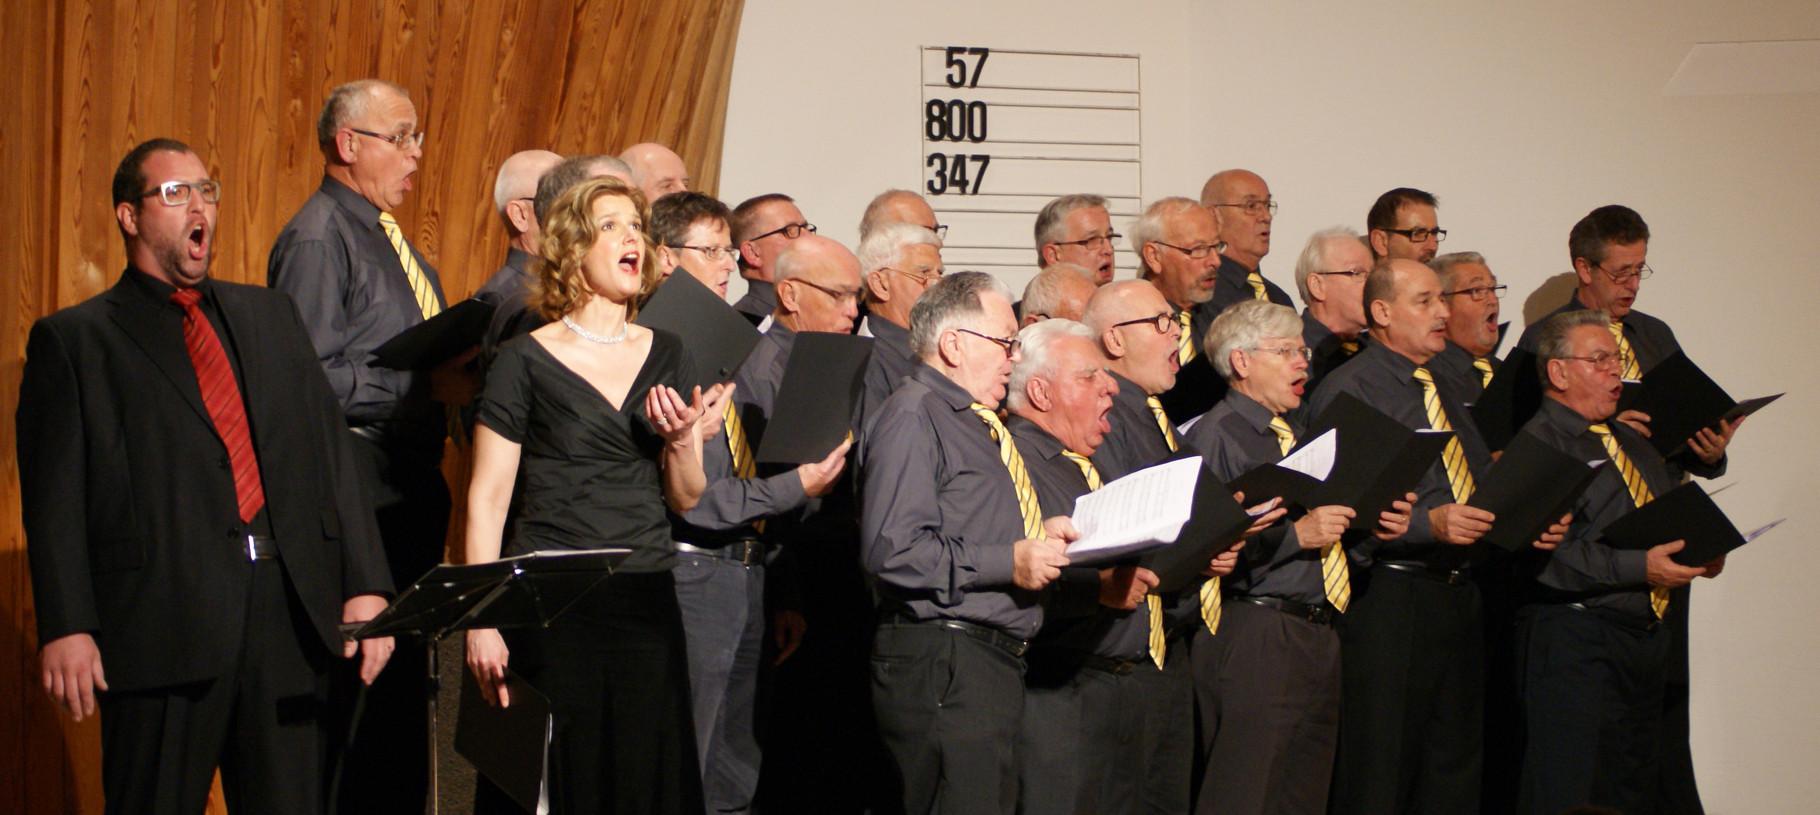 Verdi-Gala in Engstringen, November 2013